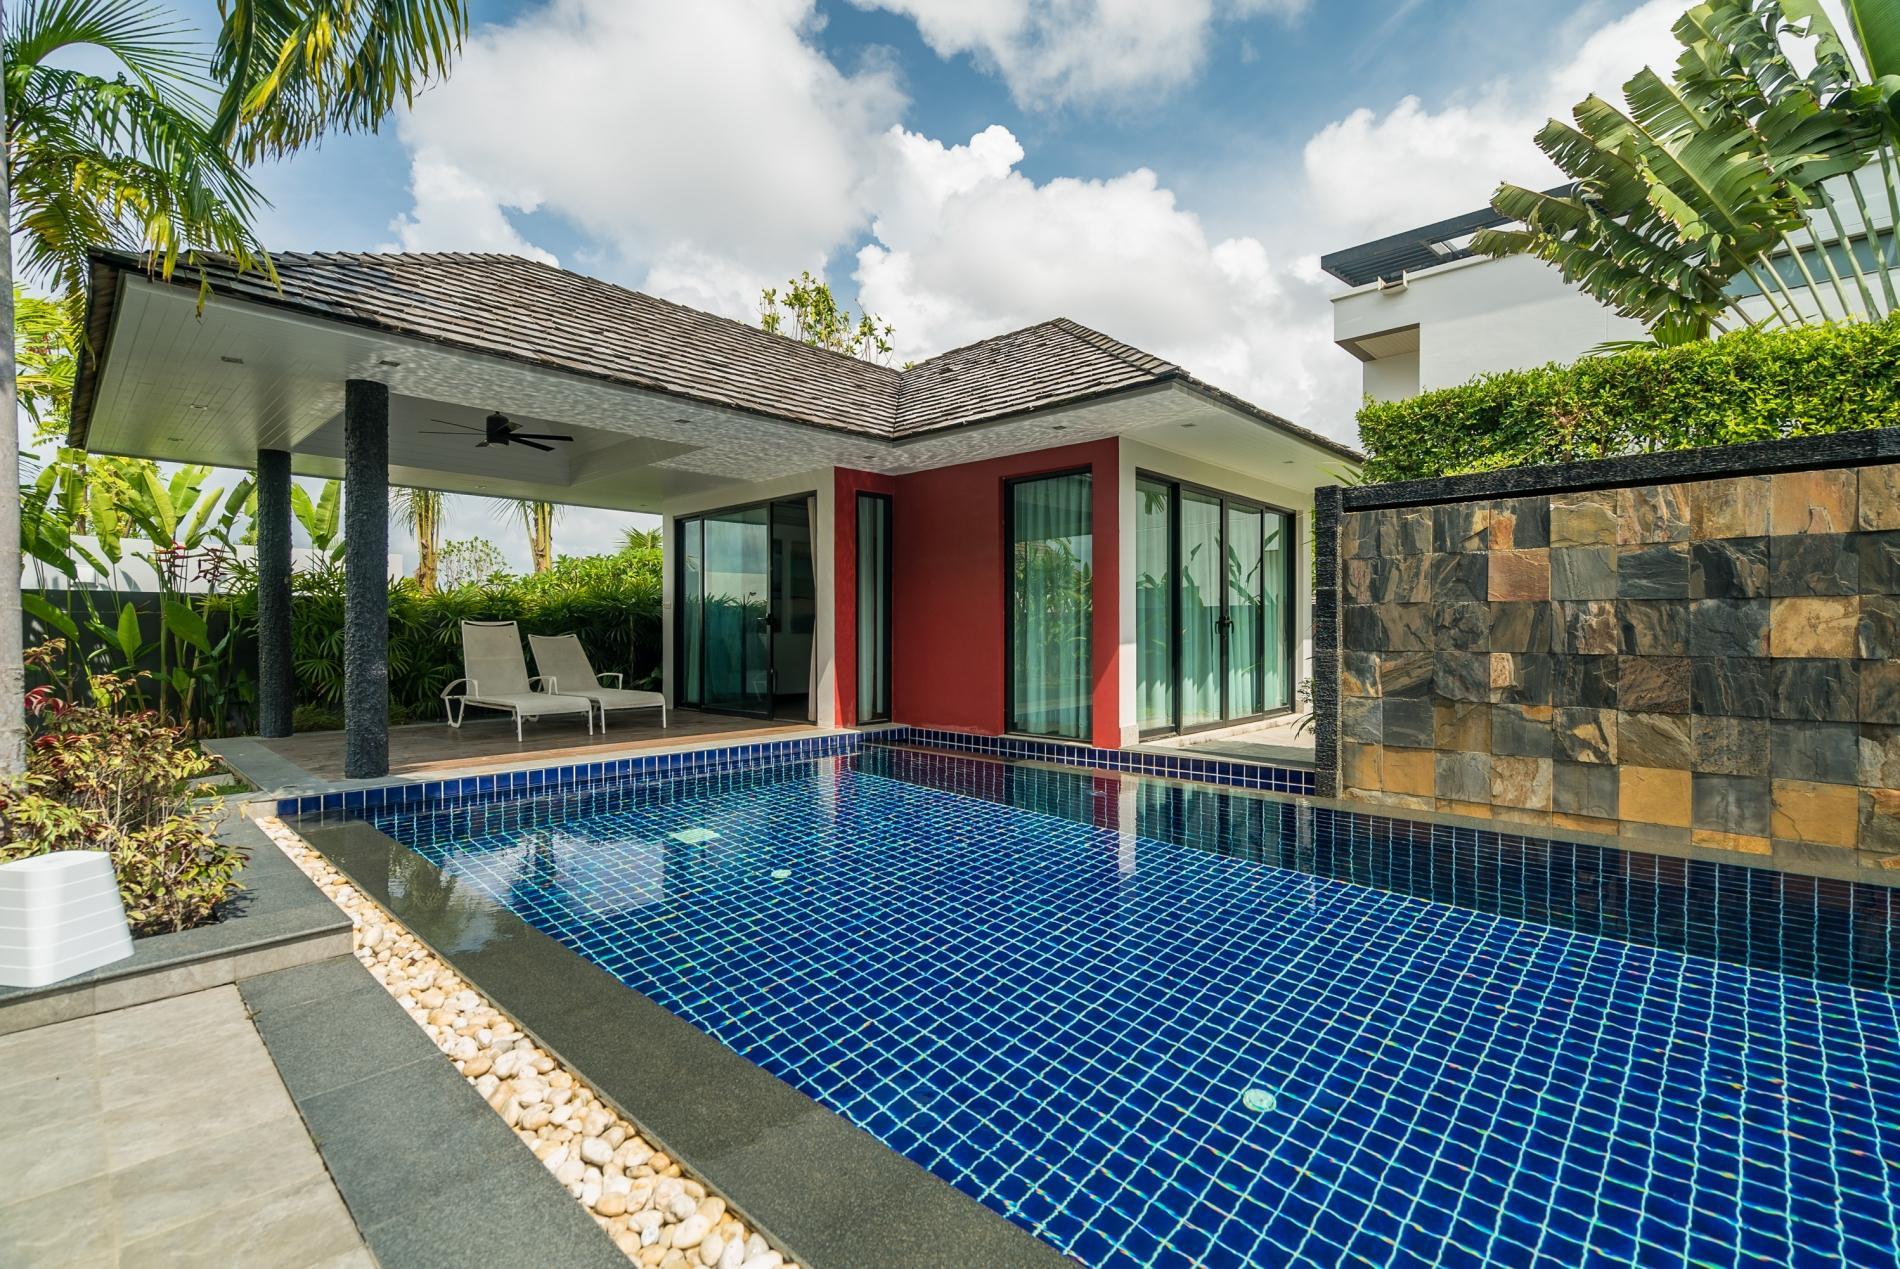 Apartment Diamond 272 - Modern 4 br private pool and garden villa photo 26956869